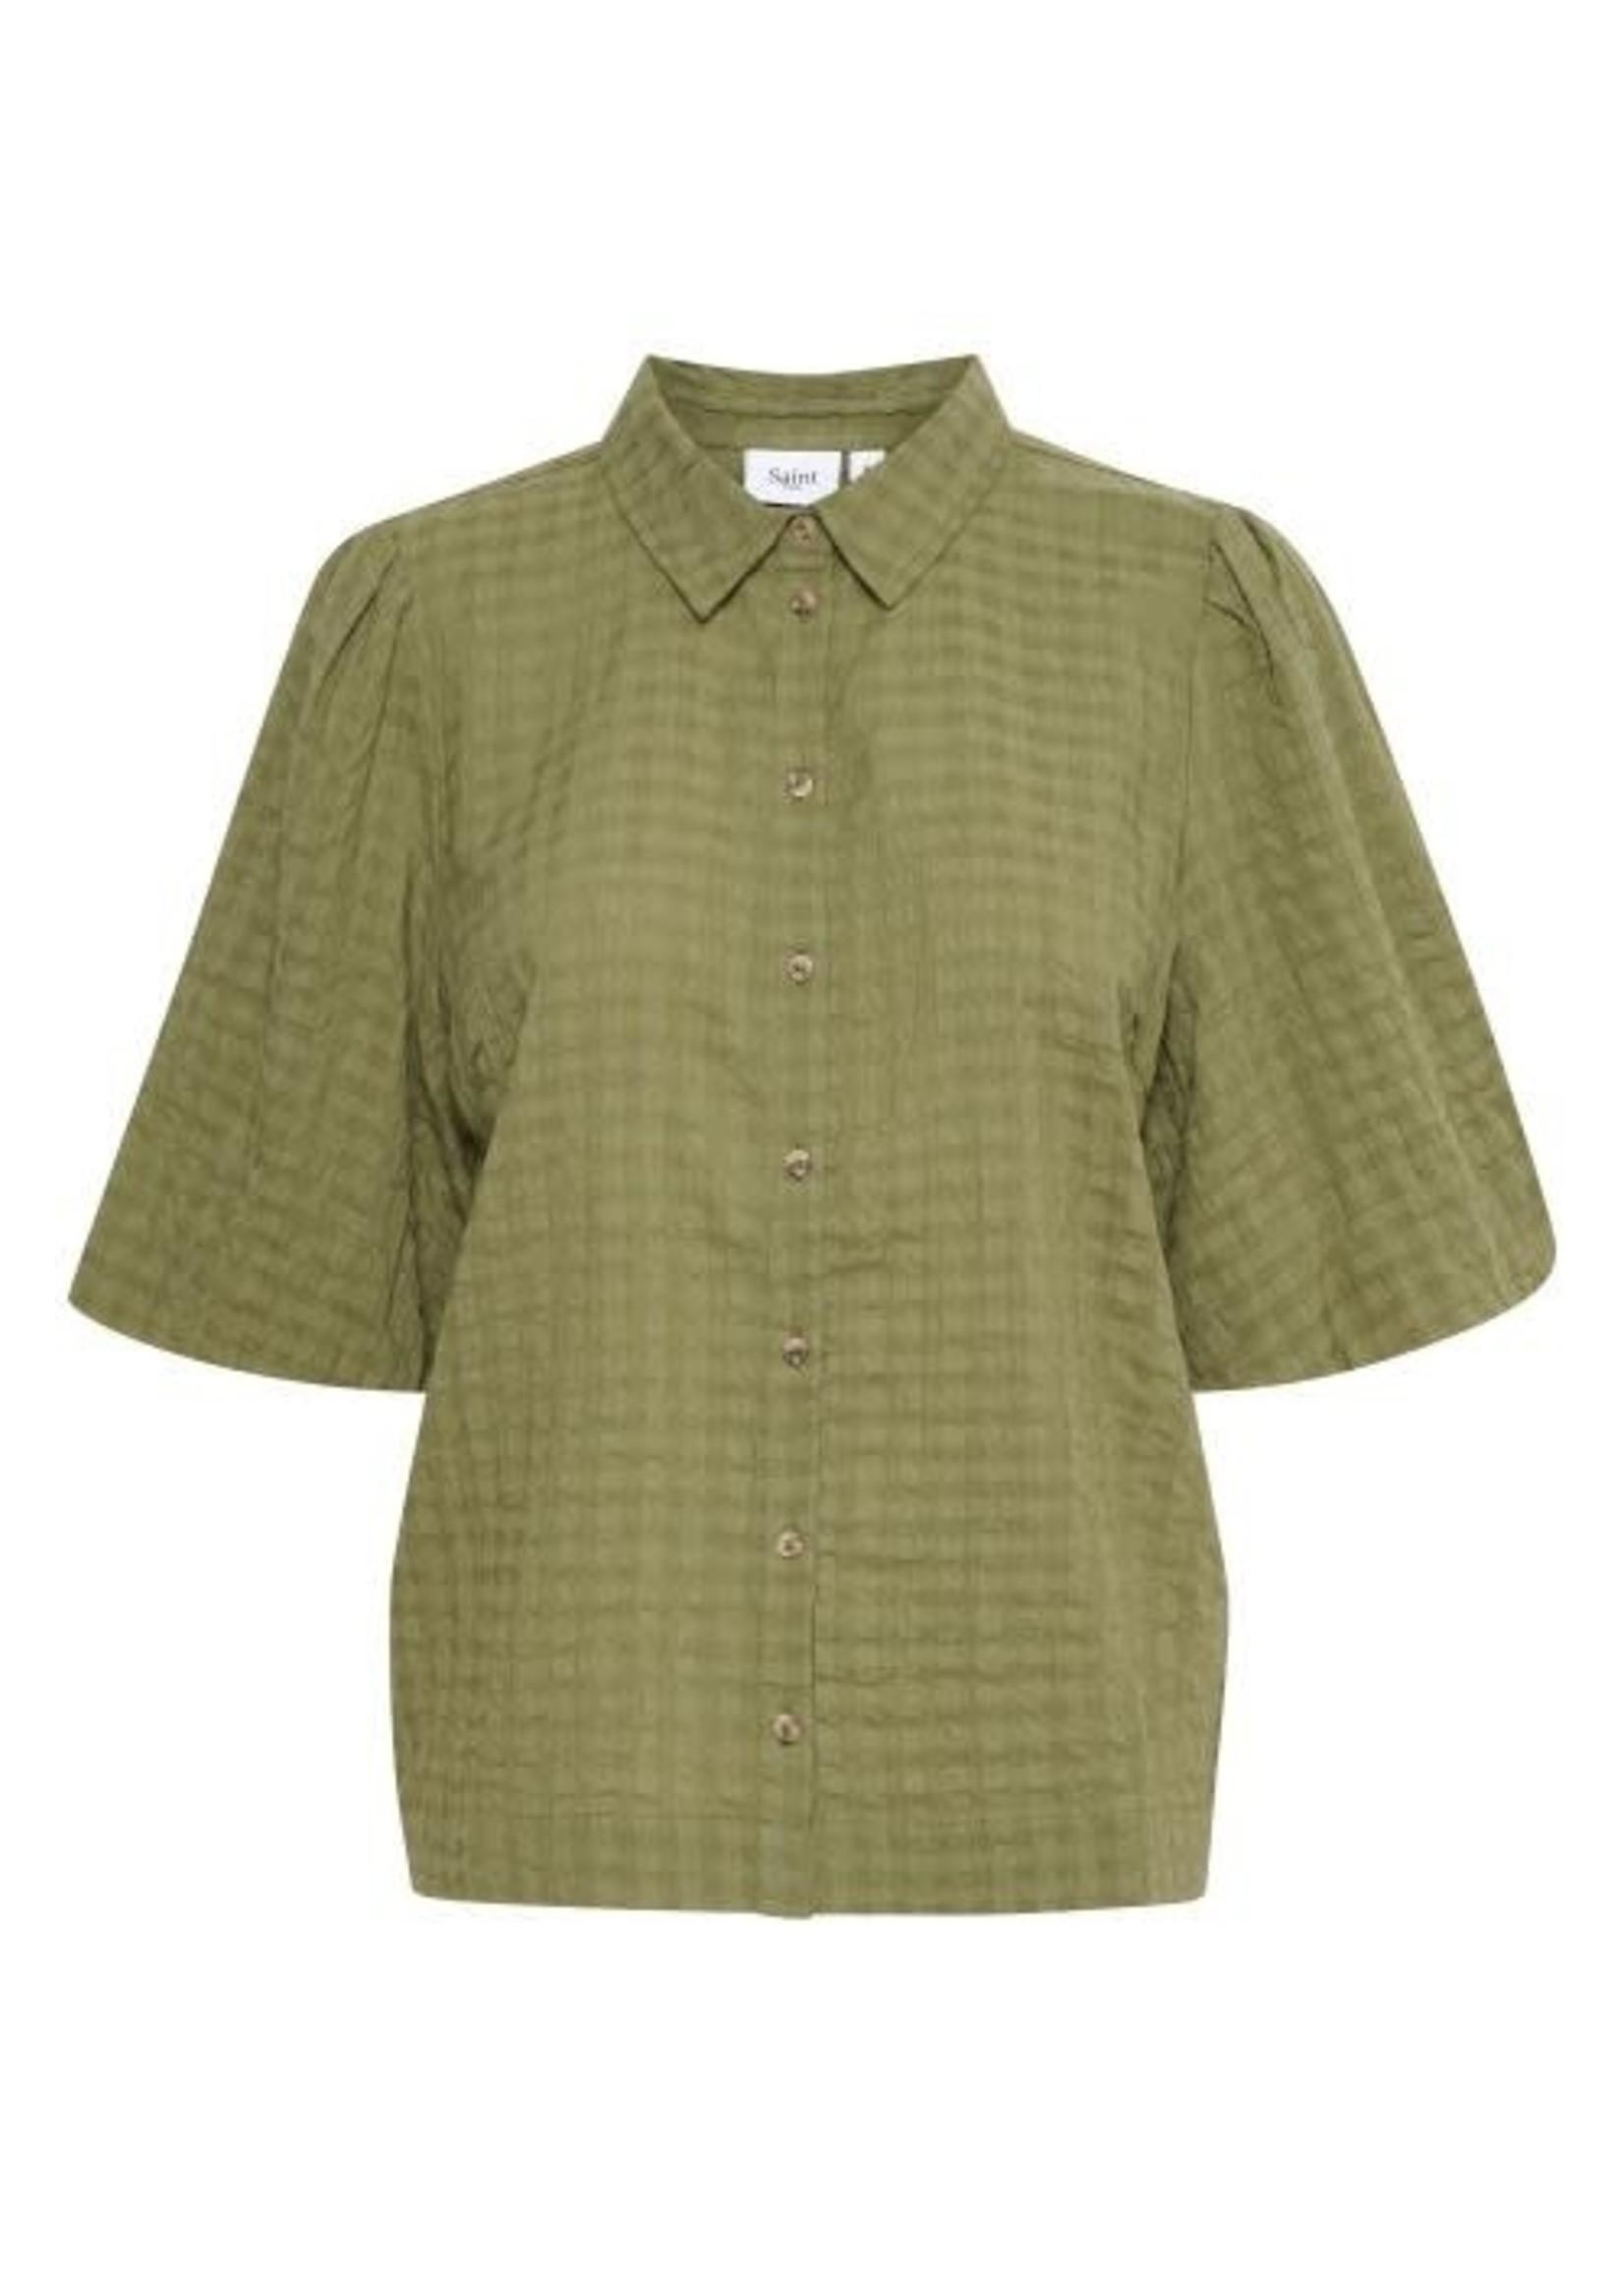 Saint Tropez Woven Shirt l/s HirliSZ Shirt